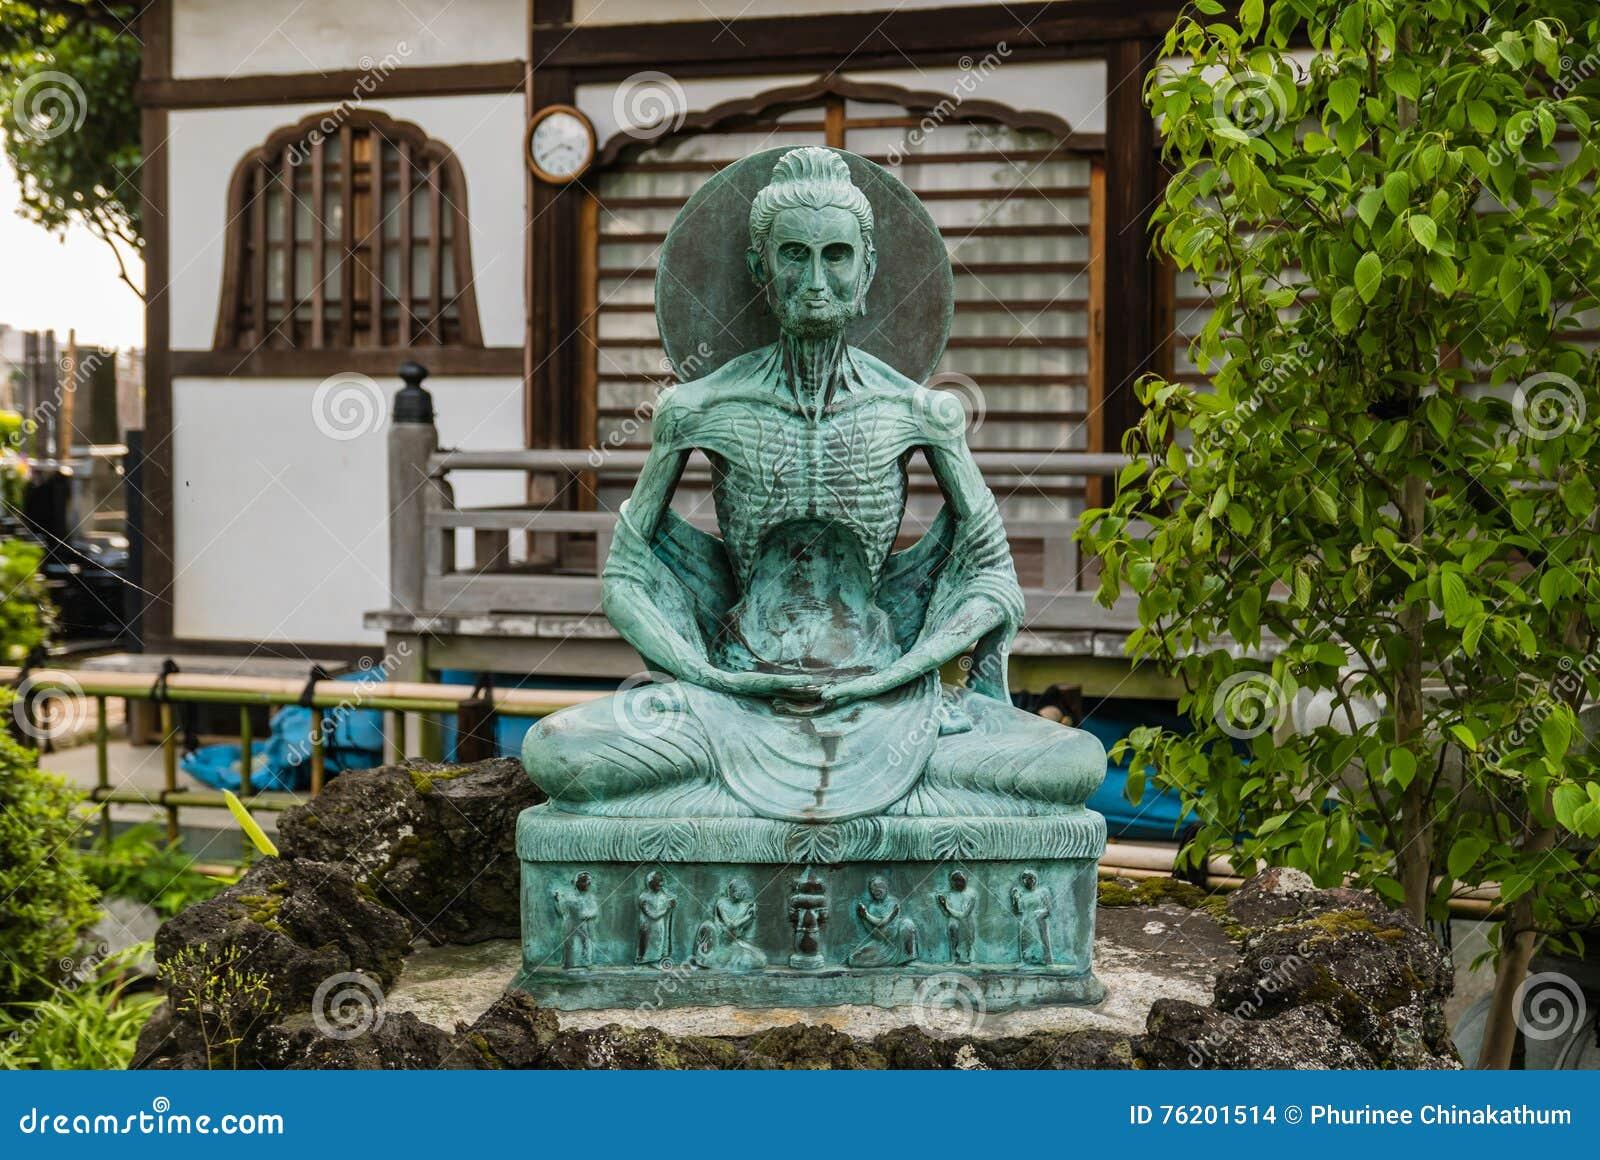 Figura de Buddha que se sienta